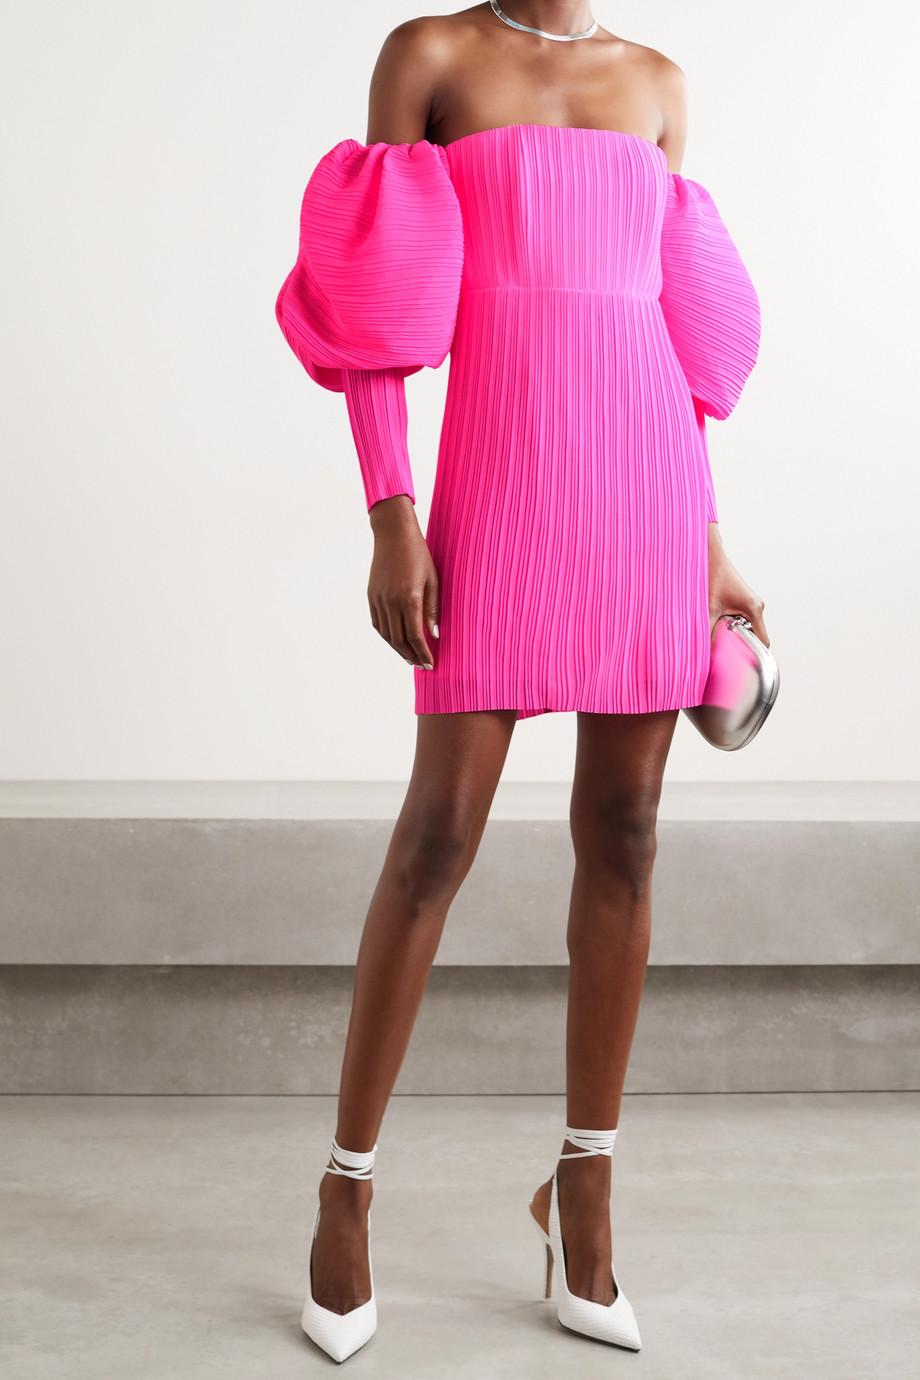 Solace London Skye schulterfreies Minikleid aus neonfarbenem plissiertem Chiffon